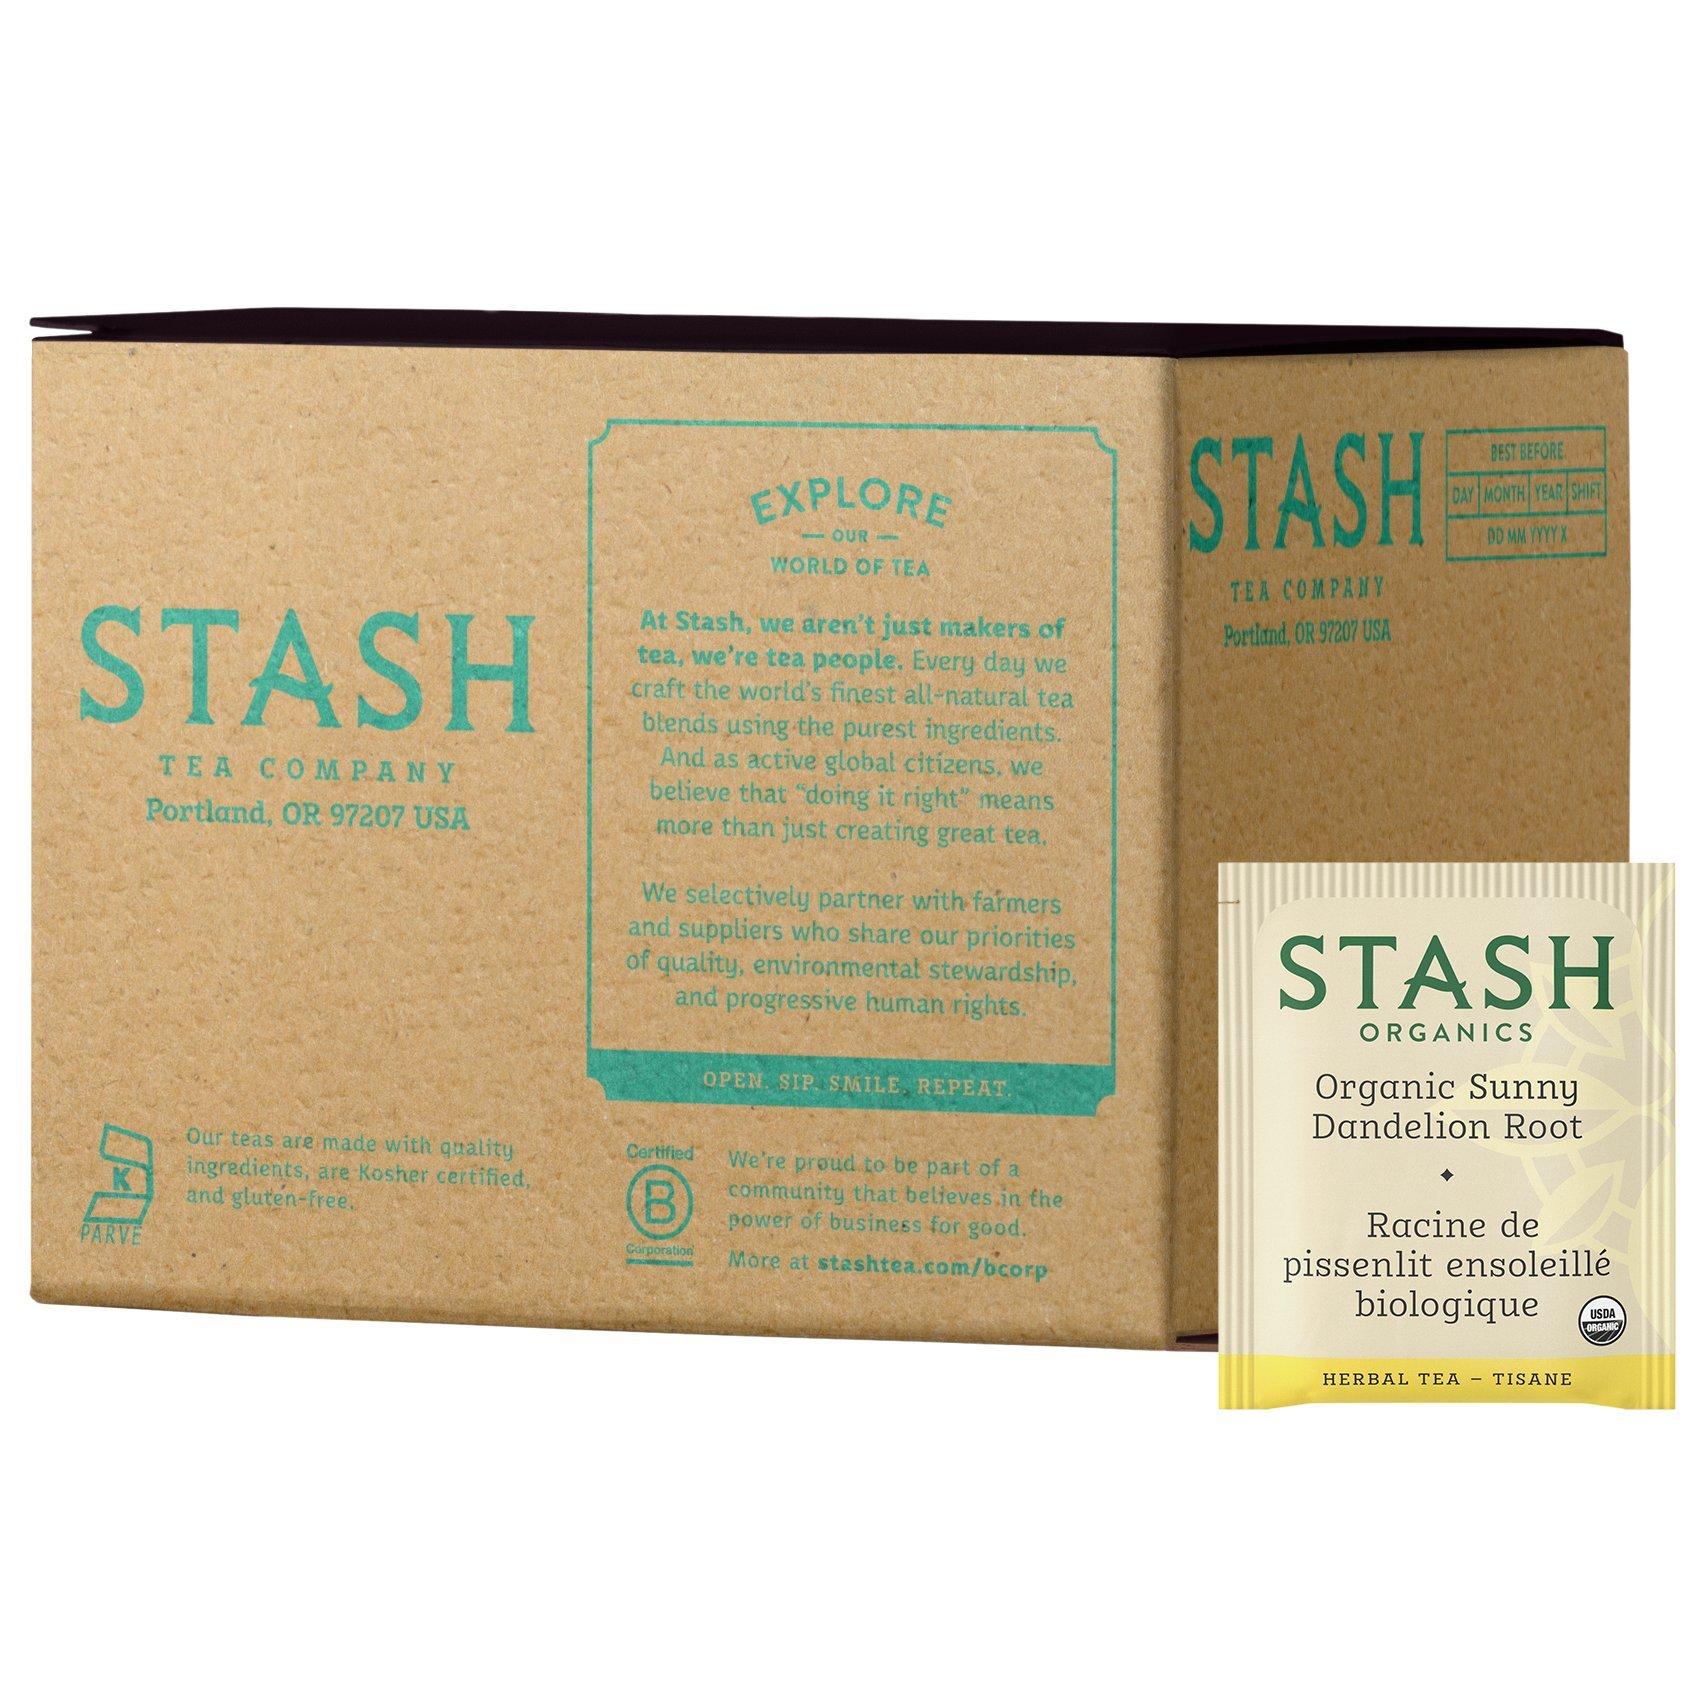 Stash Tea Organic Sunny Dandelion Root 100 Count Tea Bags (packaging may vary) Individual Herbal Tea Bags for Use in Teapots Mugs or Cups, Brew Hot Tea or Iced Tea